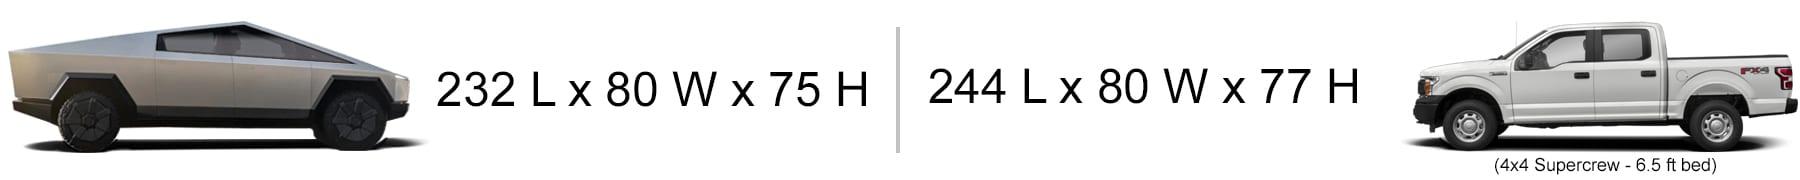 Tesla Cybertruck Size vs Ford F-150